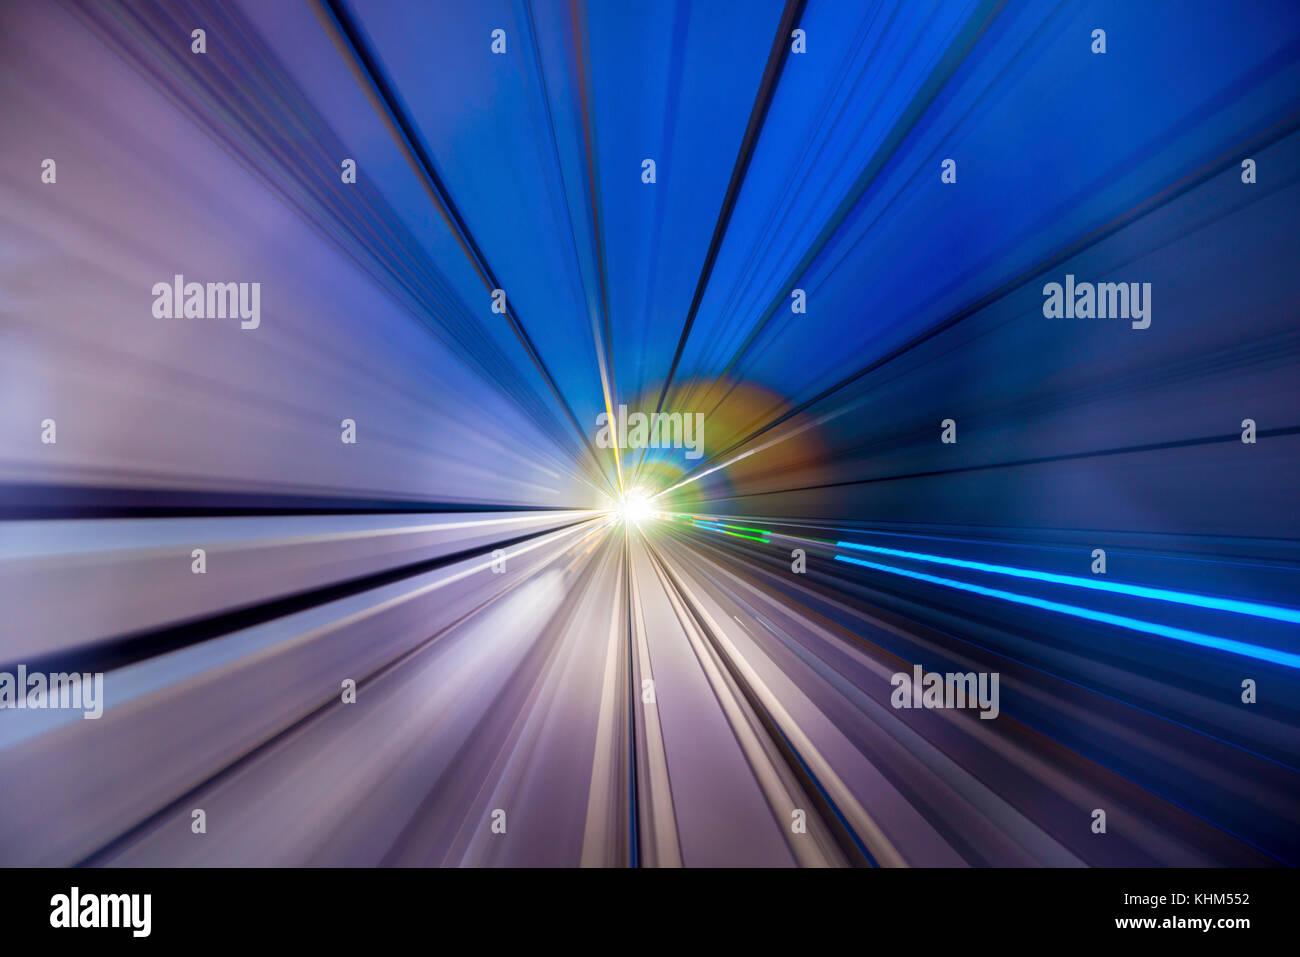 Geschwindigkeit unscharf Bewegung der Bahn oder U-Bahn Zug in Bewegung im Tunnel. Stockbild